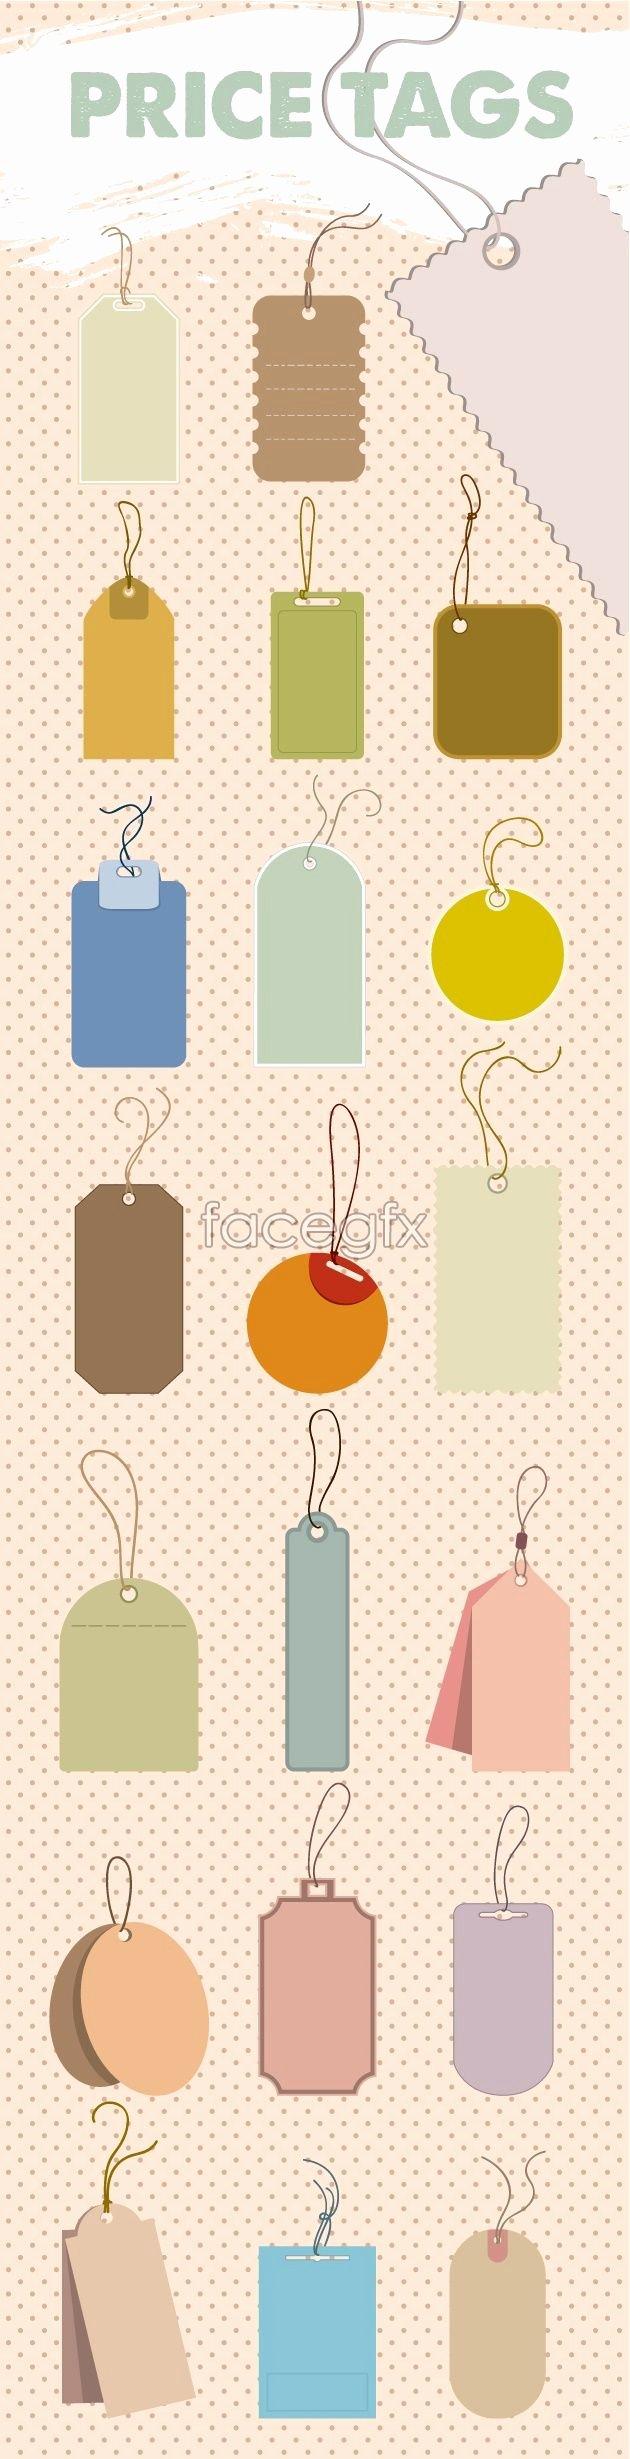 Price Tag Templates Printable Elegant Best 25 Price Tags Ideas On Pinterest